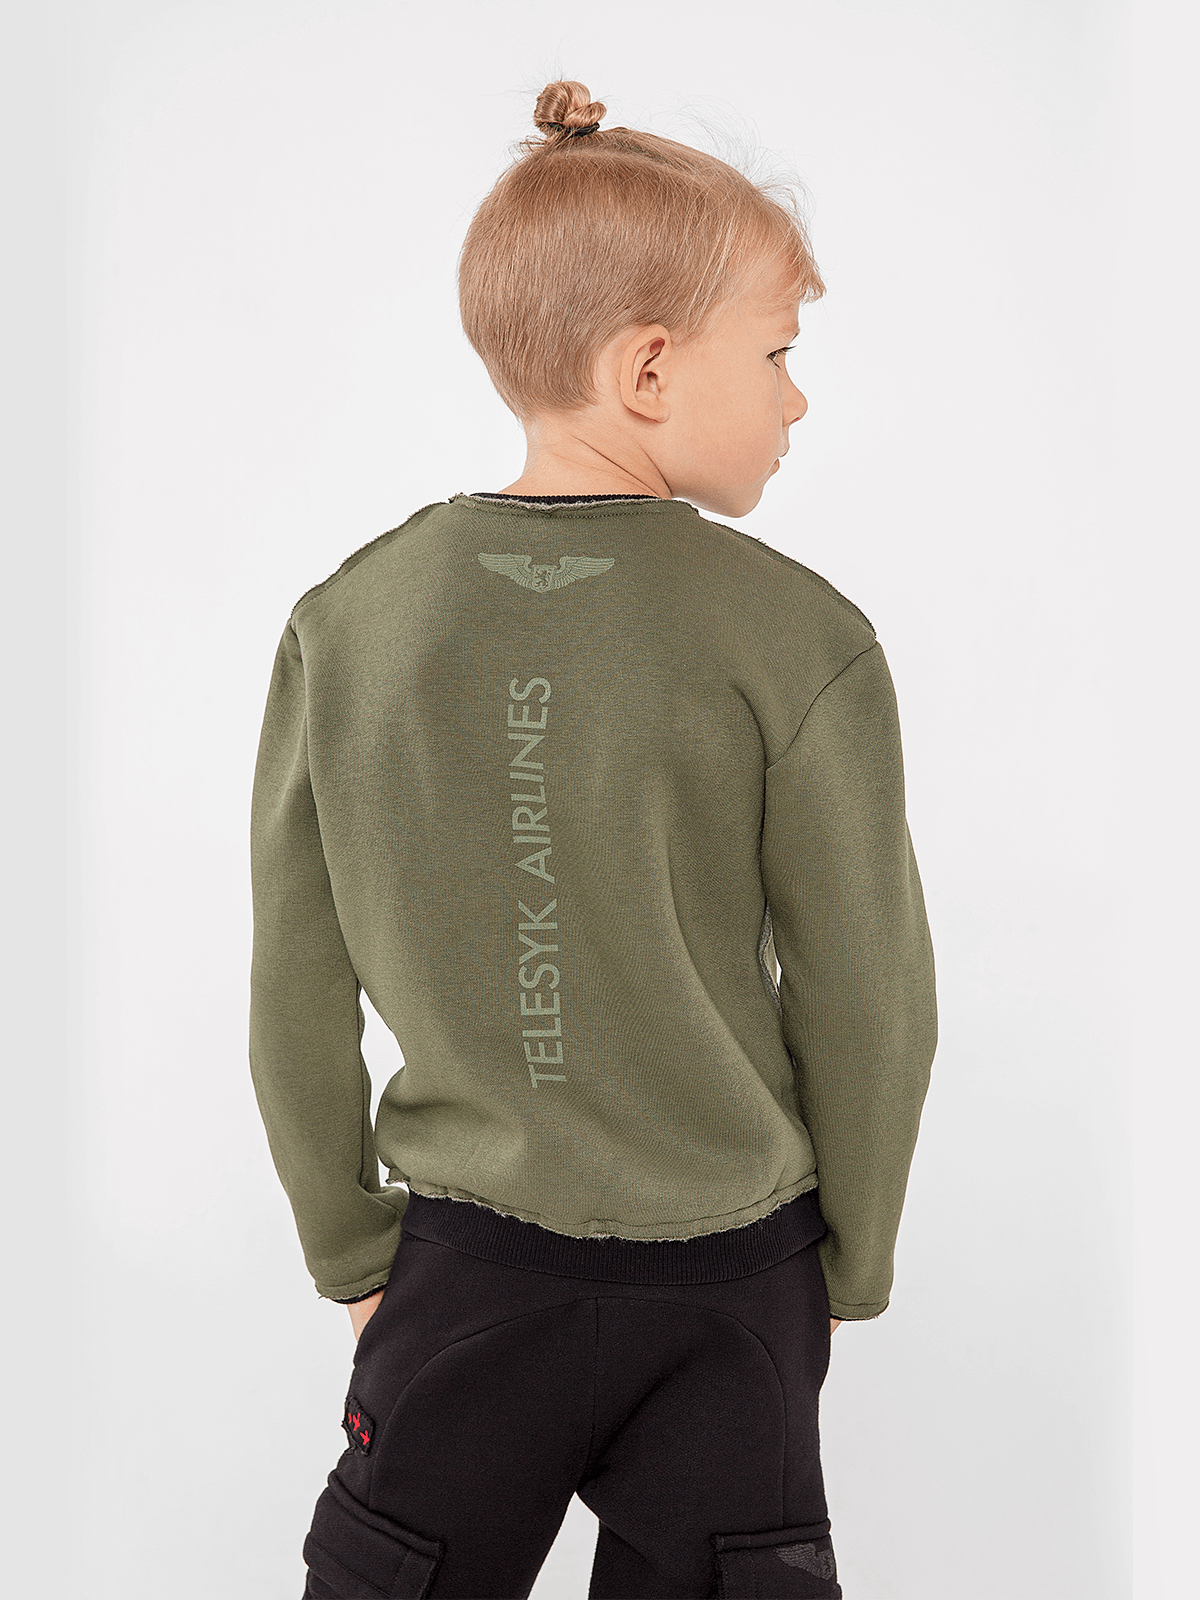 Kids Sweatshirt Dragon Won't Get It!. Color khaki.  Material: 77% cotton, 23% polyester.